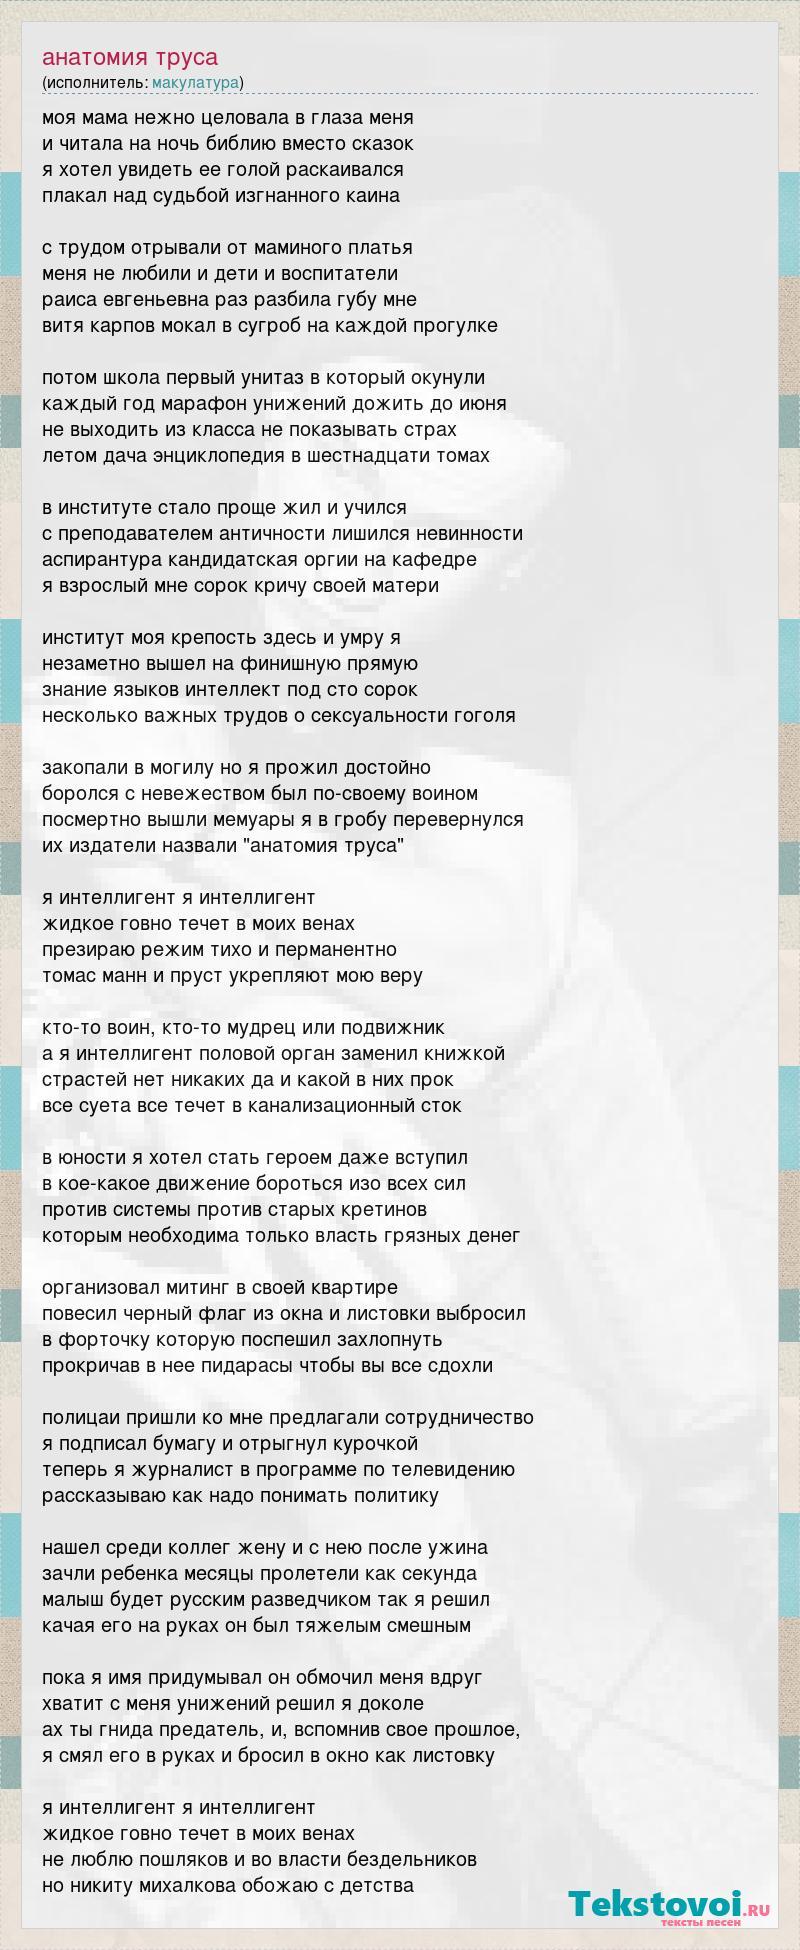 Макулатуру анатомия труса текст сколько стоит макулатура в барнауле